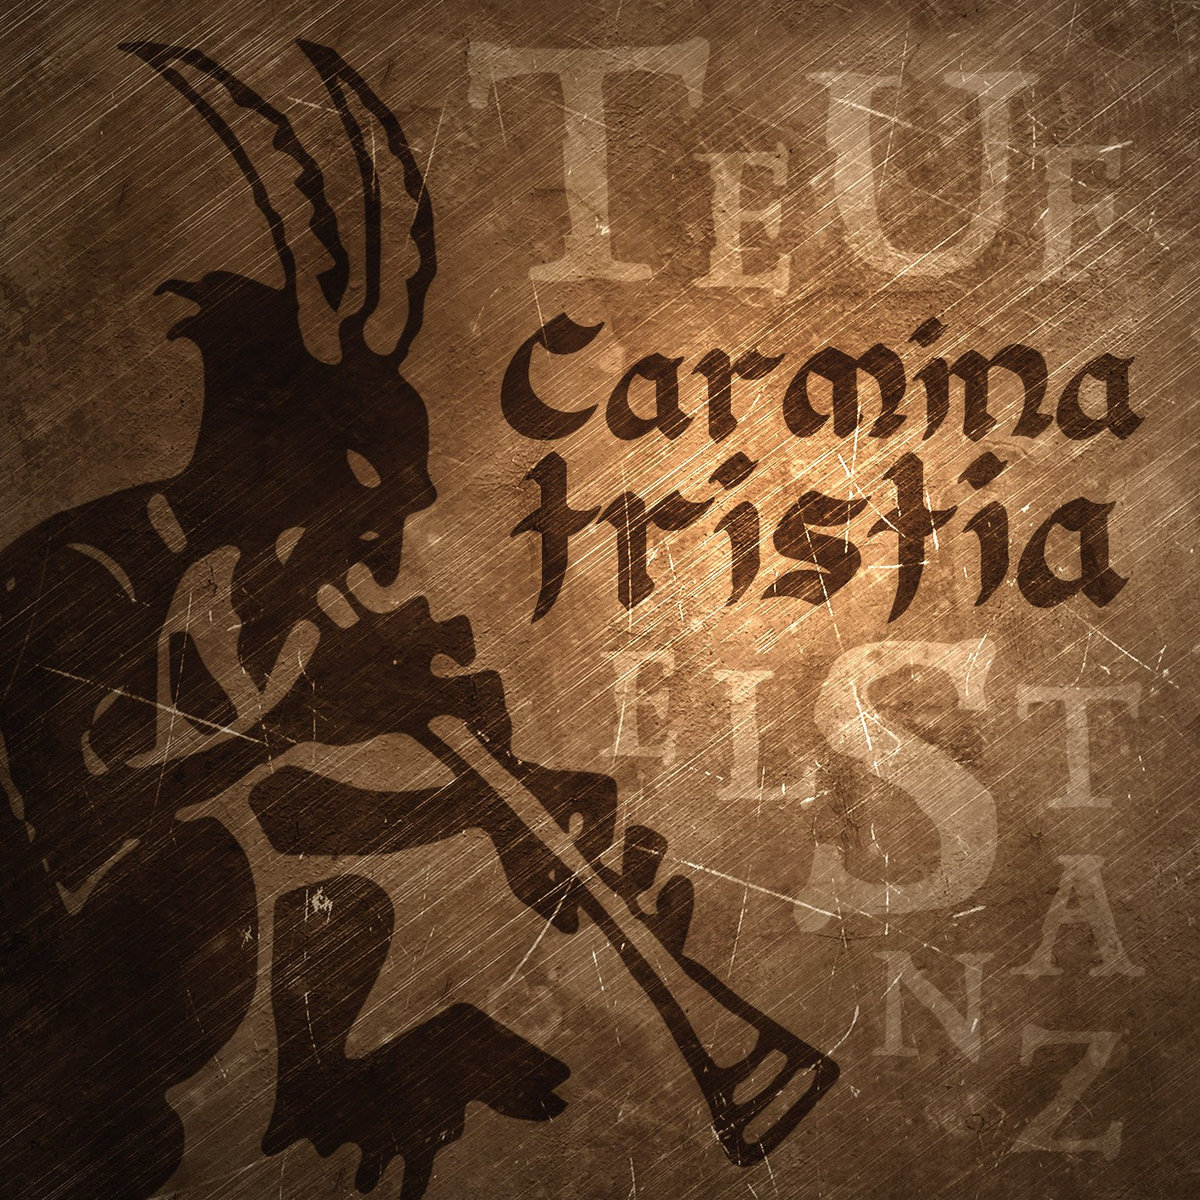 celtic punk songs - 600×600